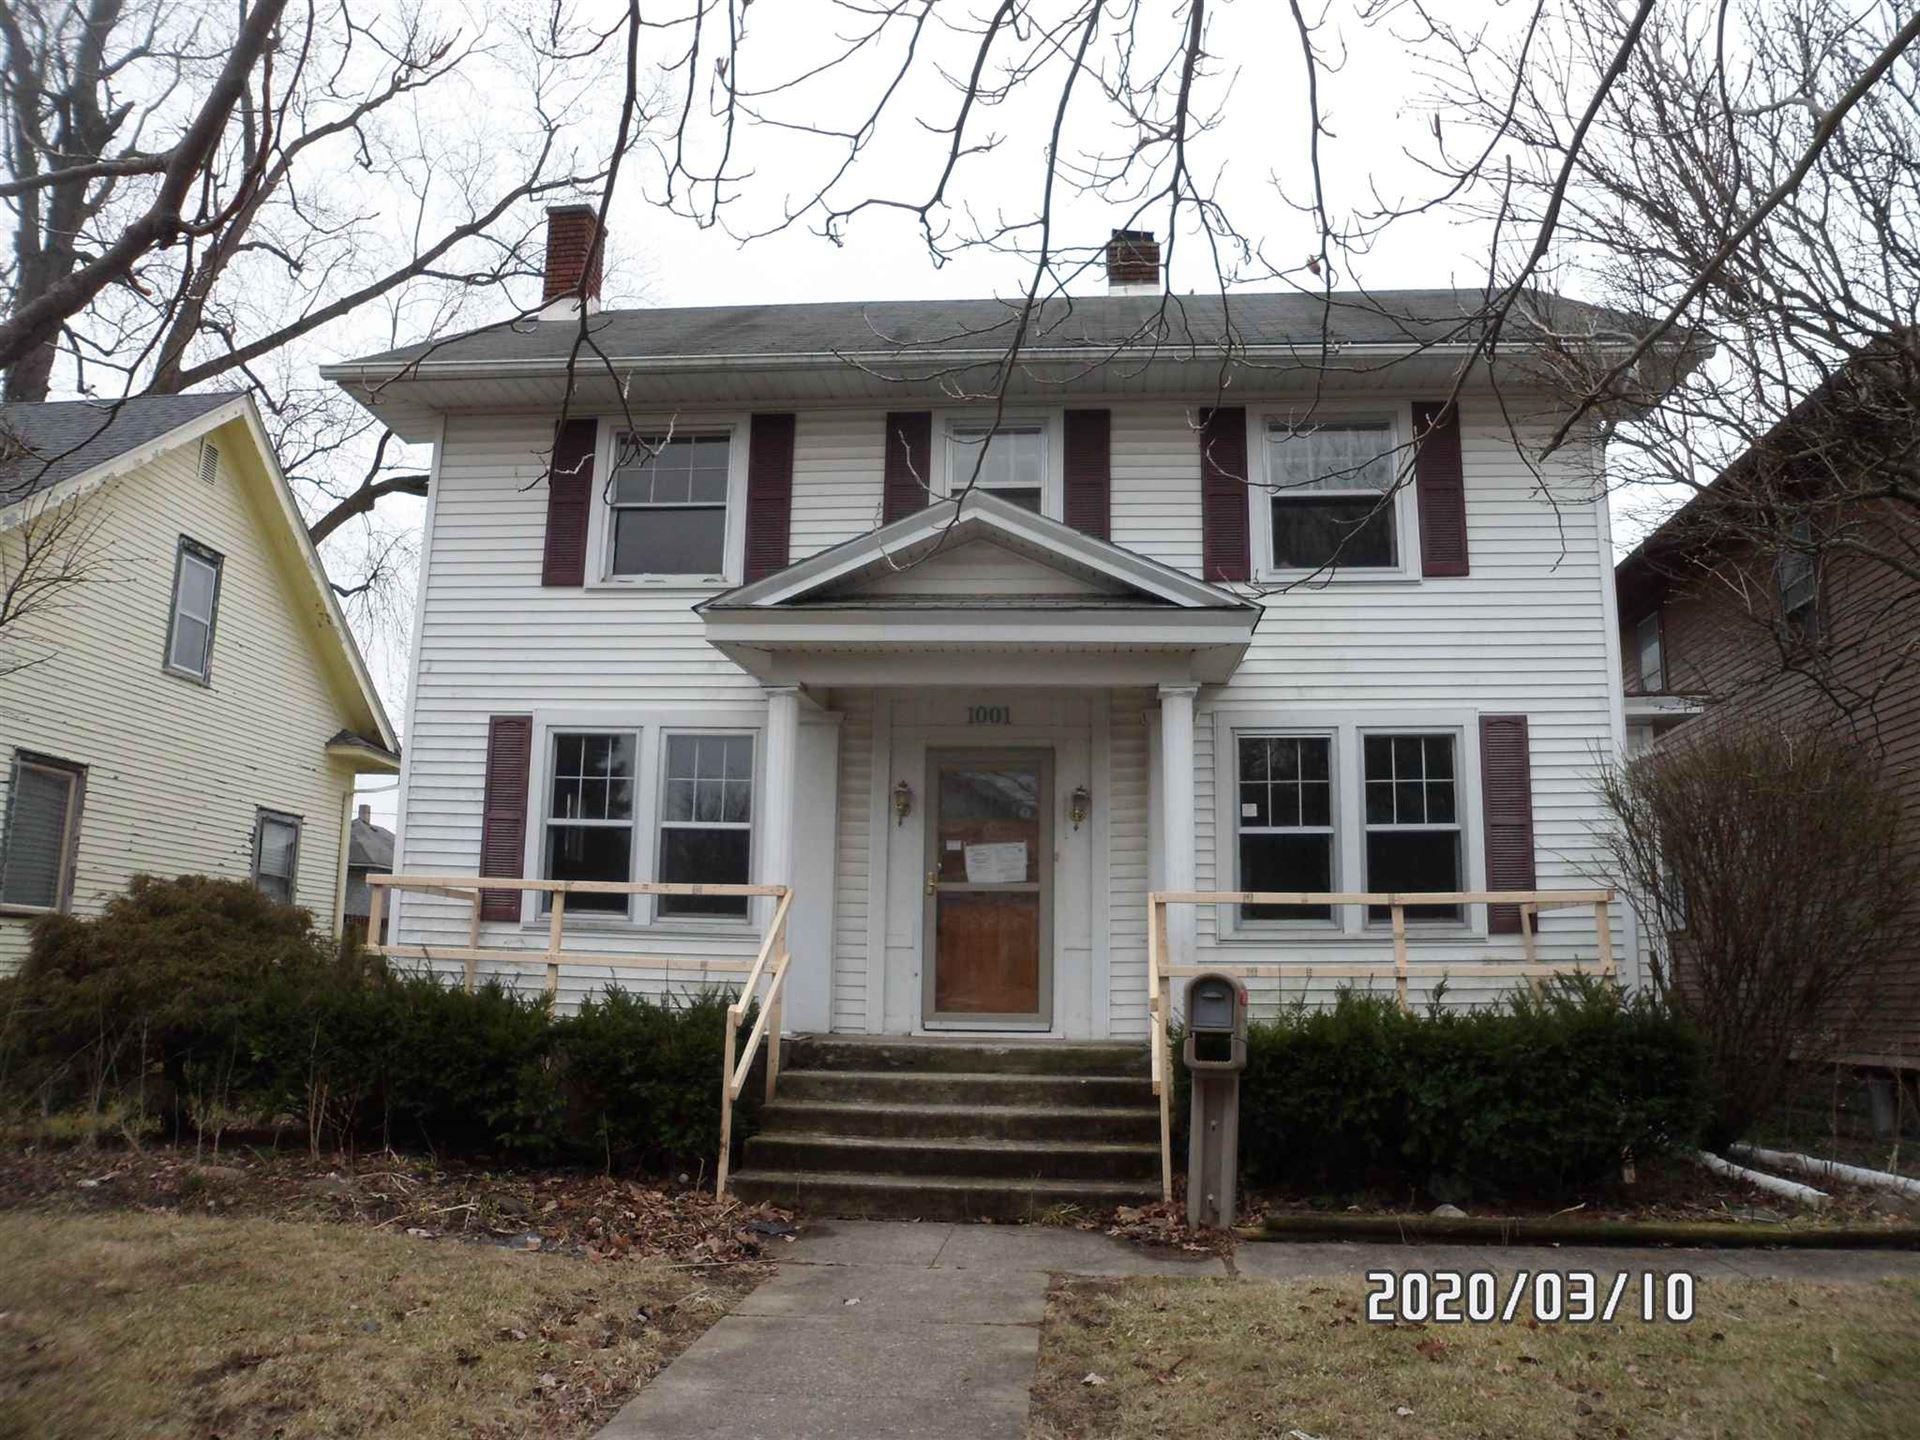 1001 Kinsmoor Avenue, Fort Wayne, IN 46807 - #: 202010518